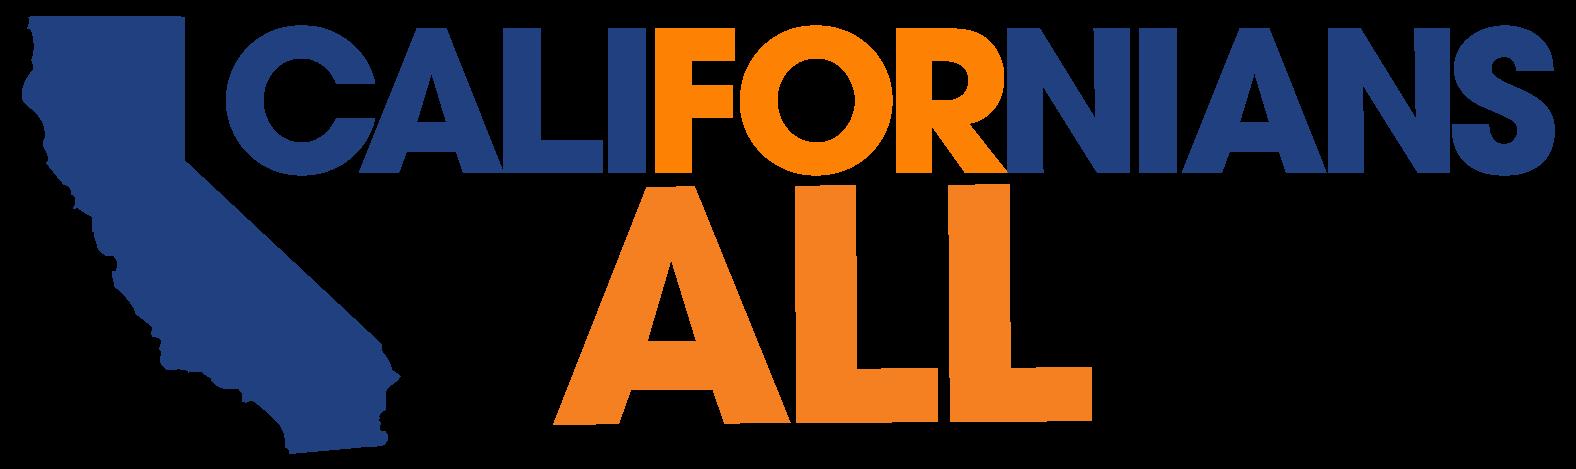 logo - californians for all